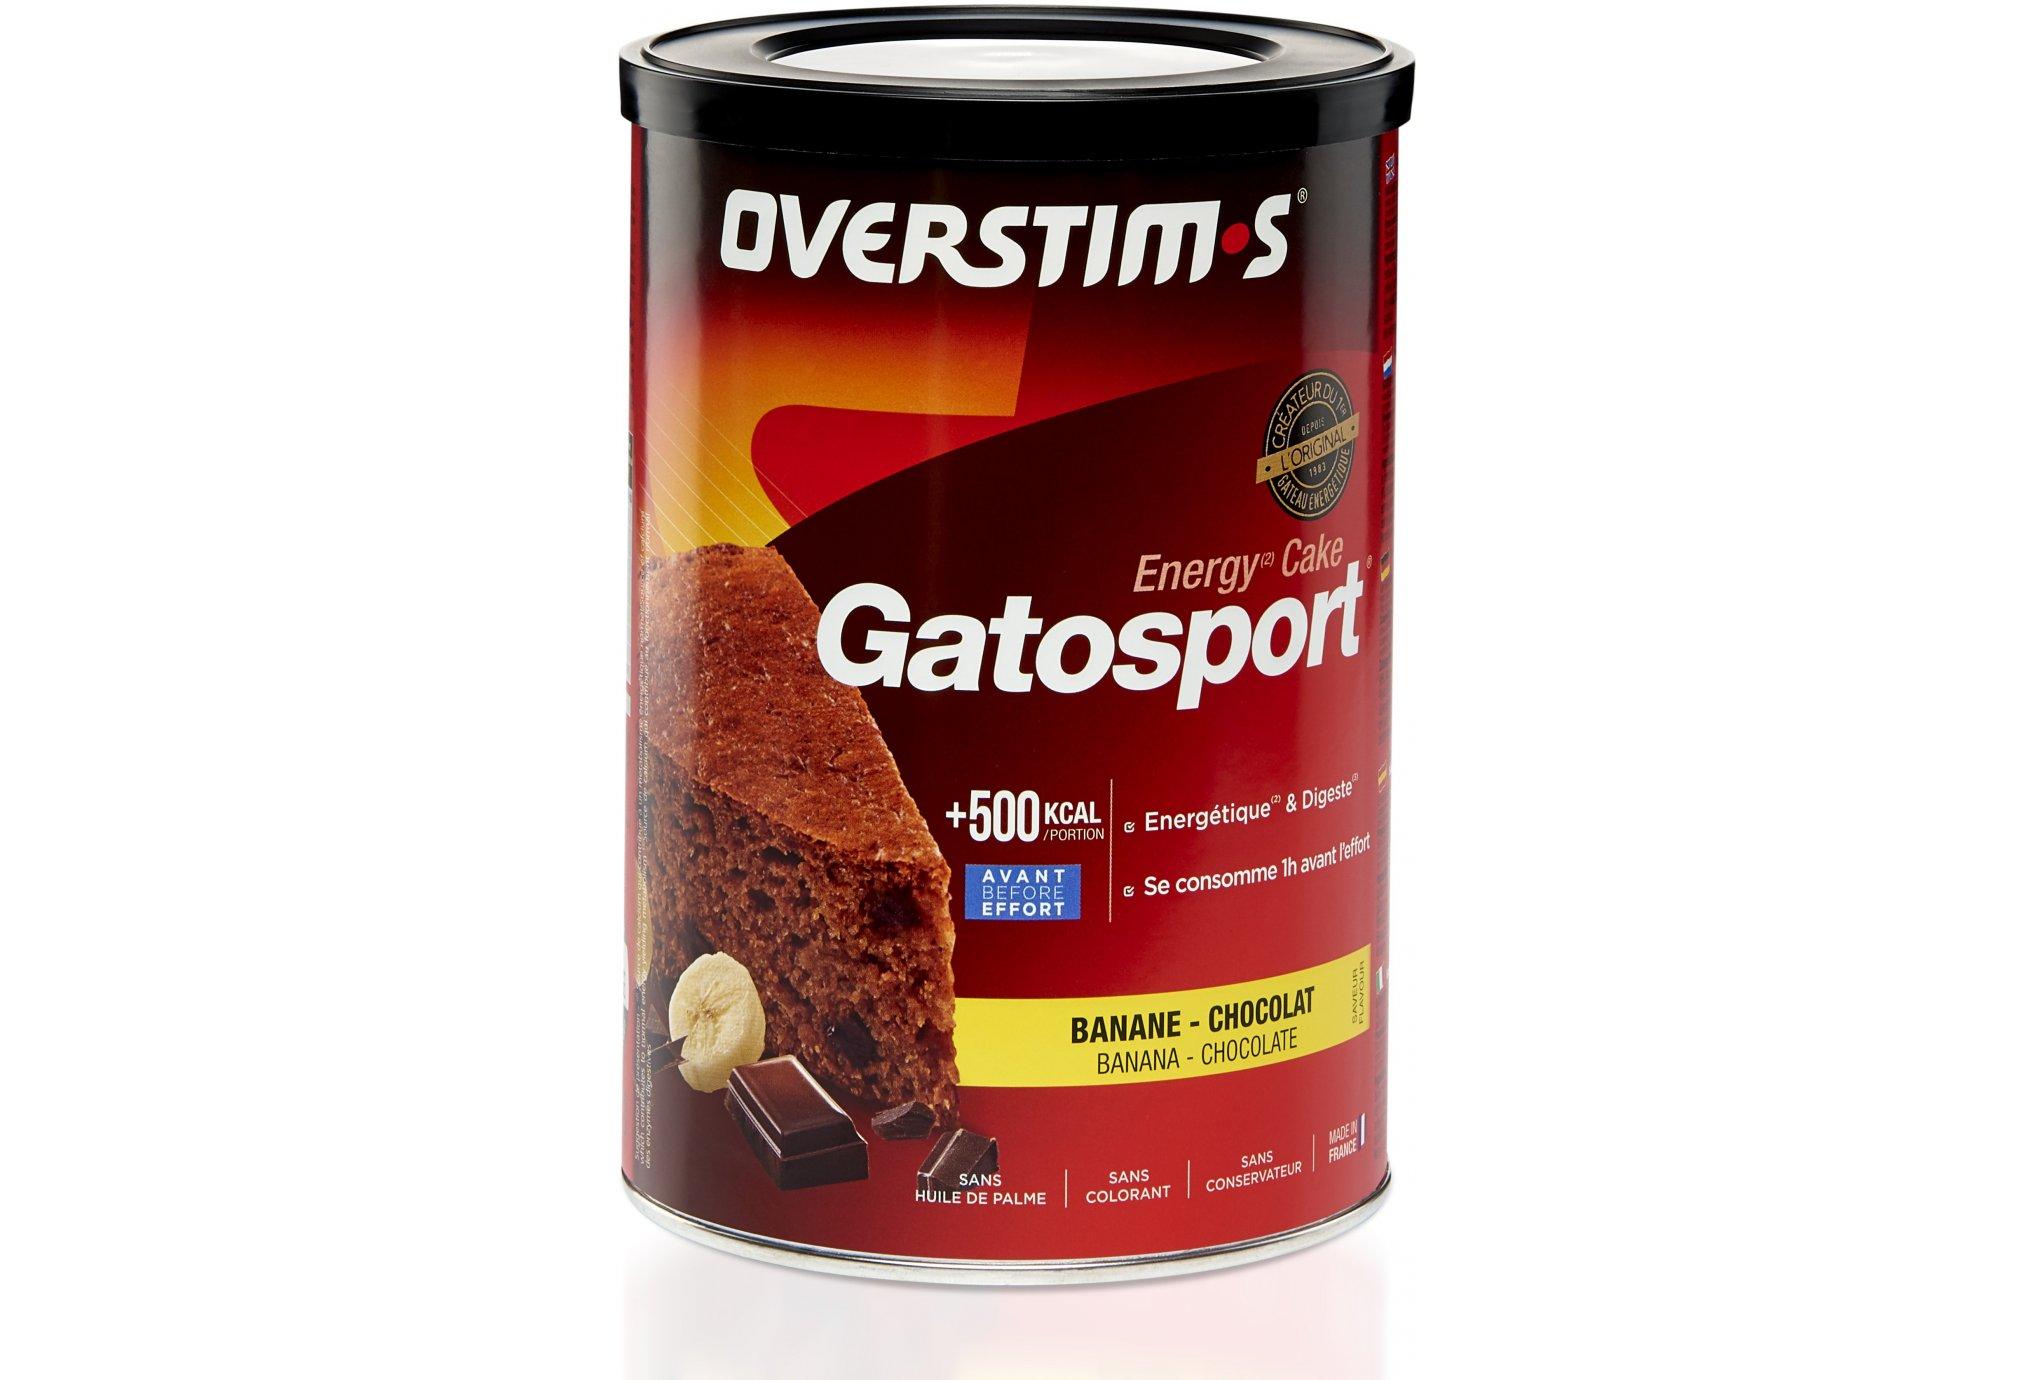 OVERSTIMS Gatosport 400 g - Banane/chocolat Diététique Préparation